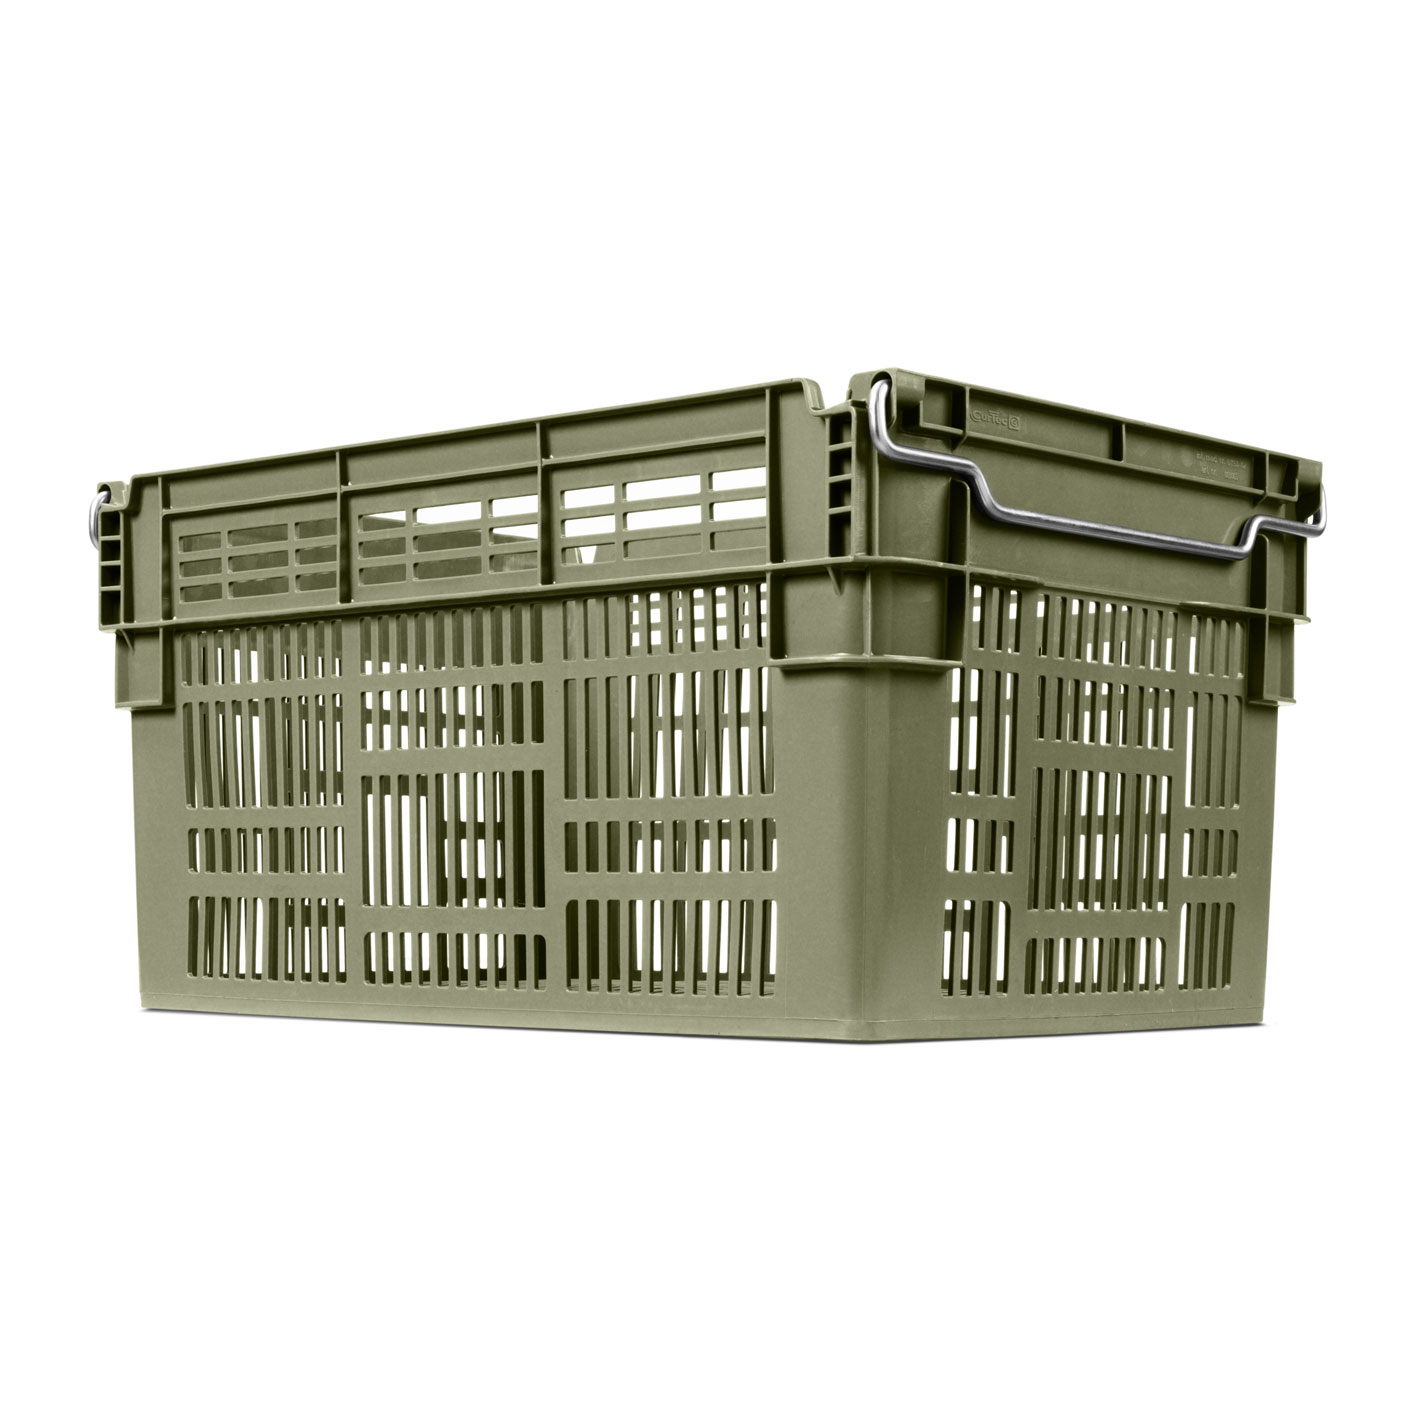 60 litre swingbar crate